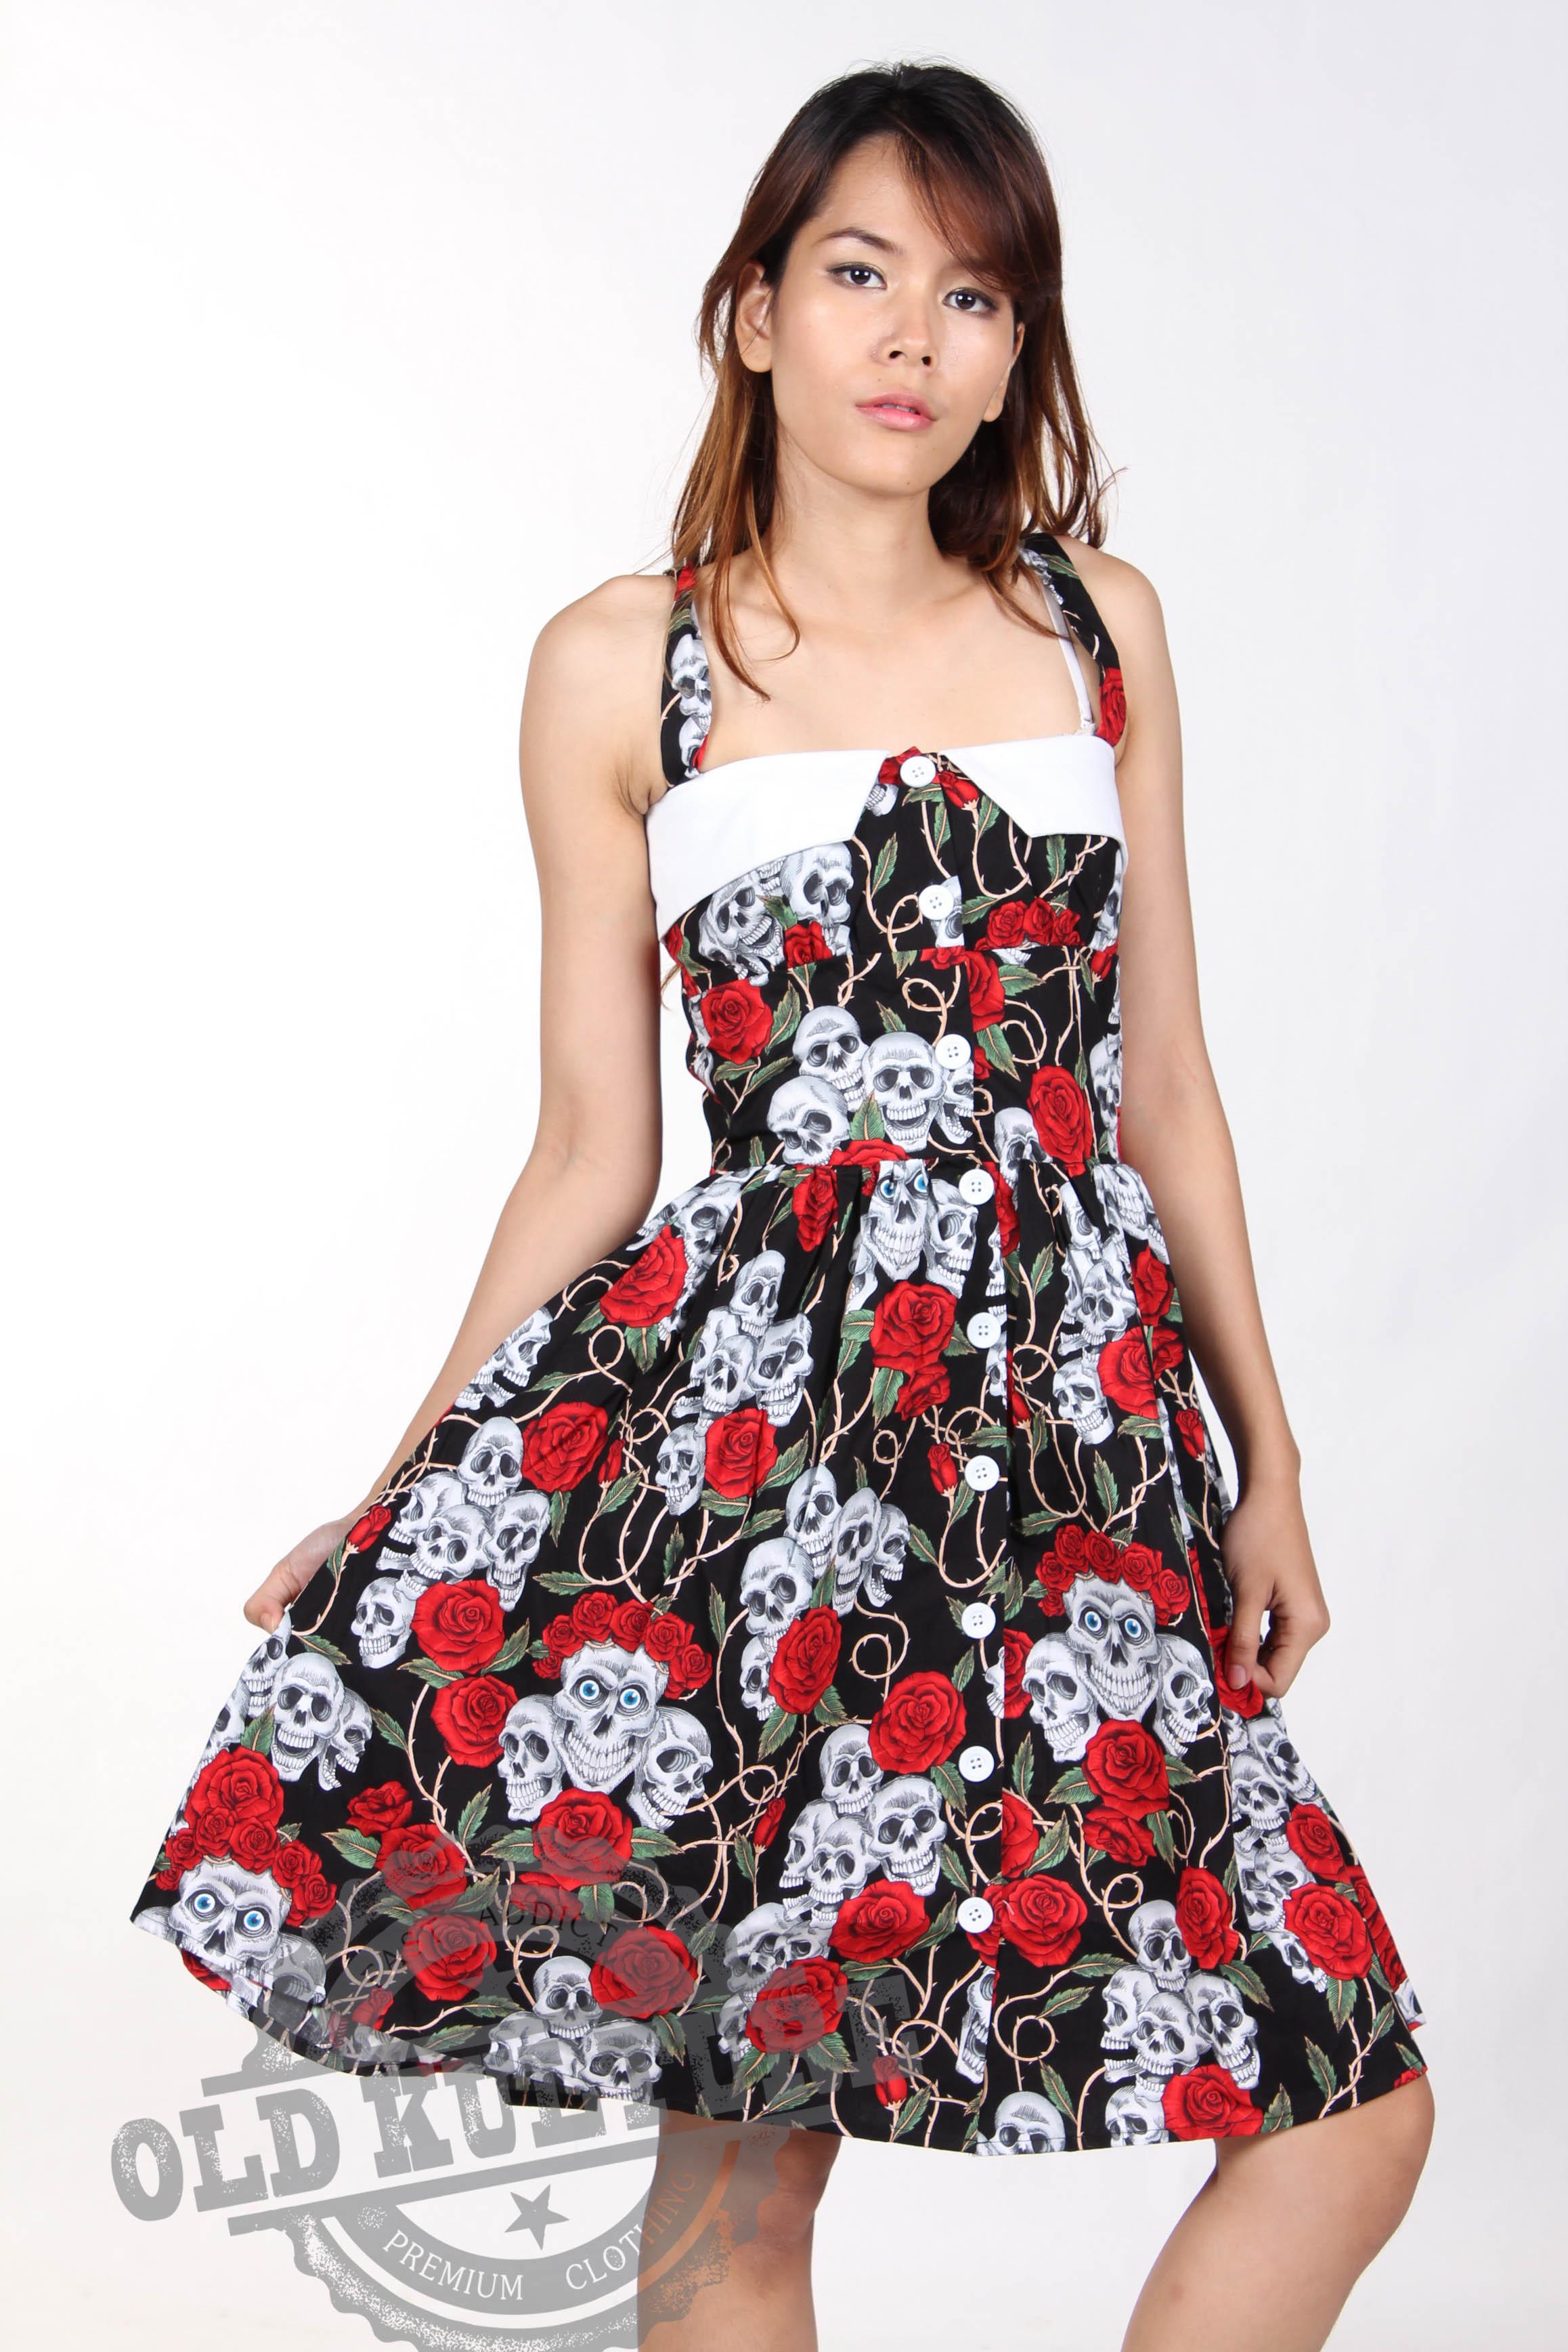 rockabilly_women_dress_skull_roses_retro_vintage_pin_up_cocktail_prom_party_unique_design_d23_dresses_5.JPG